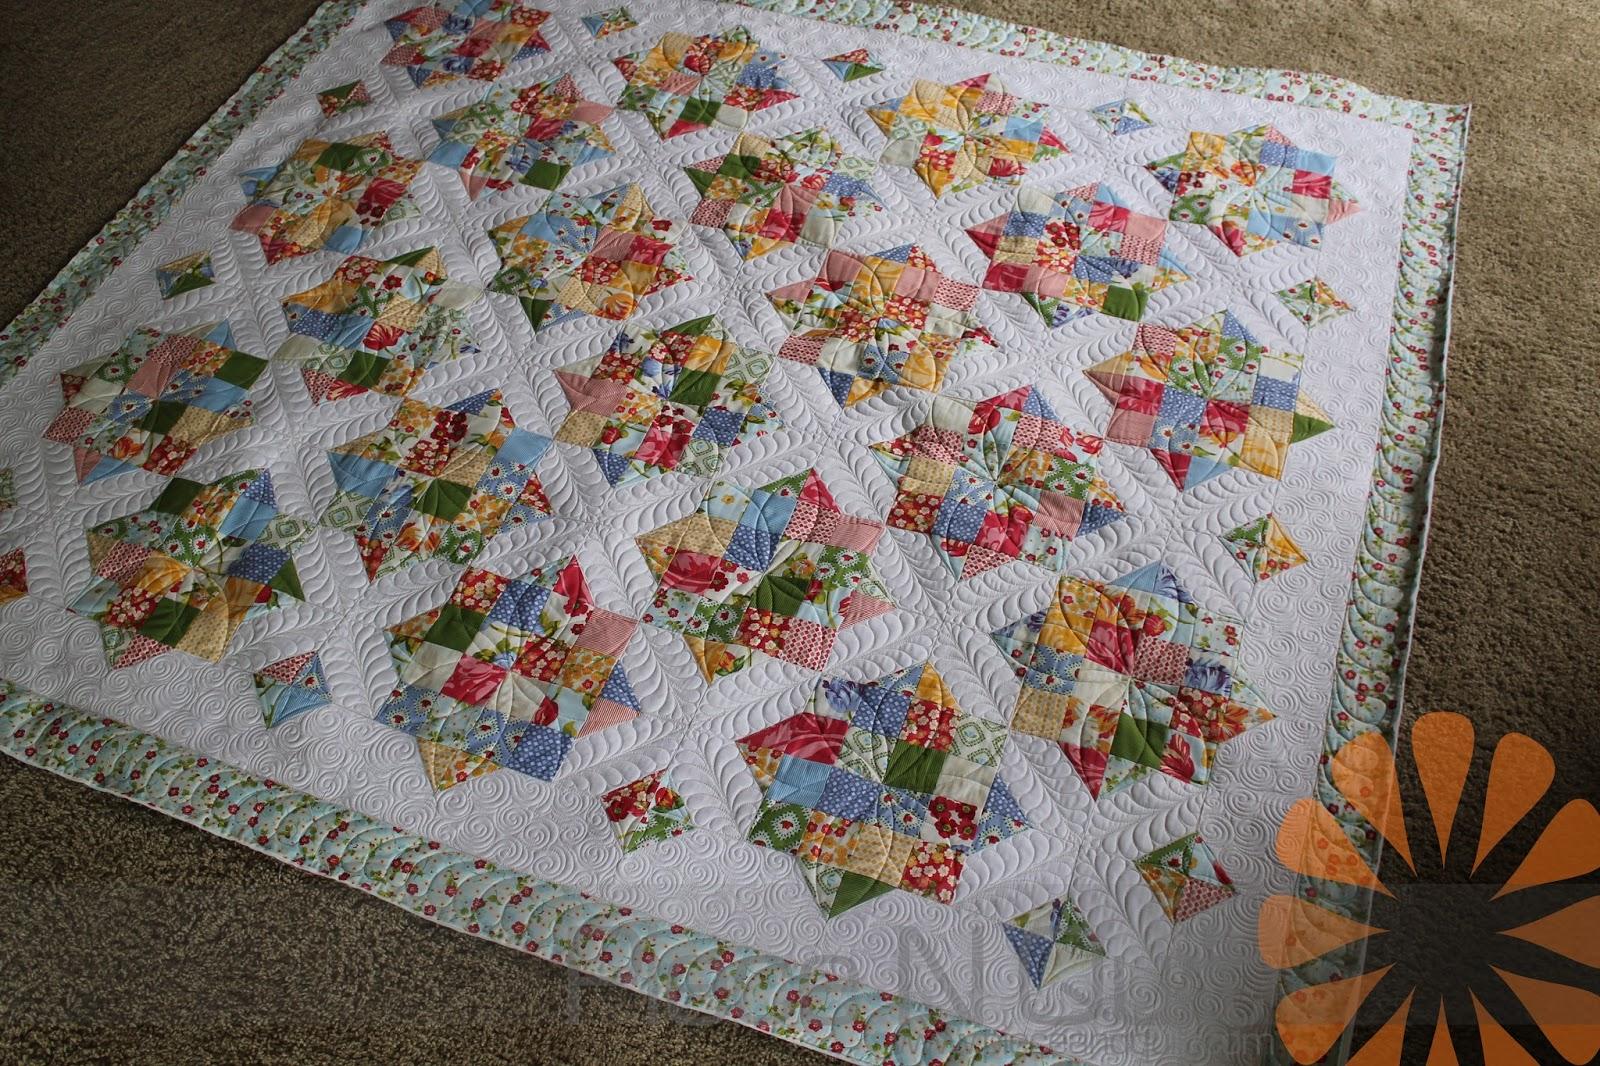 Piece N Quilt Custom Machine Quilting A Scrappy Quilt By